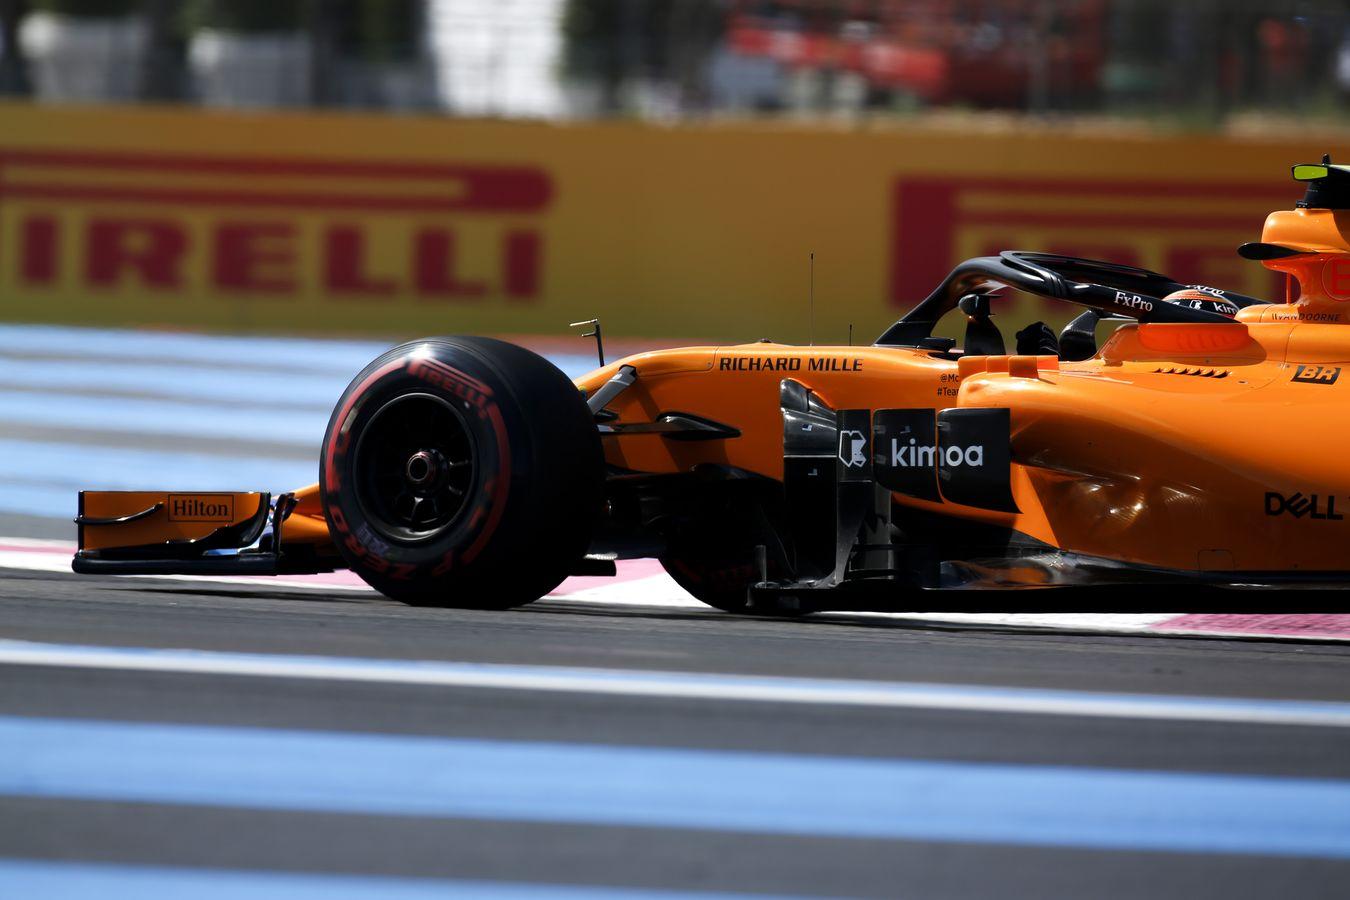 Mclaren Formula 1 2018 French Grand Prix